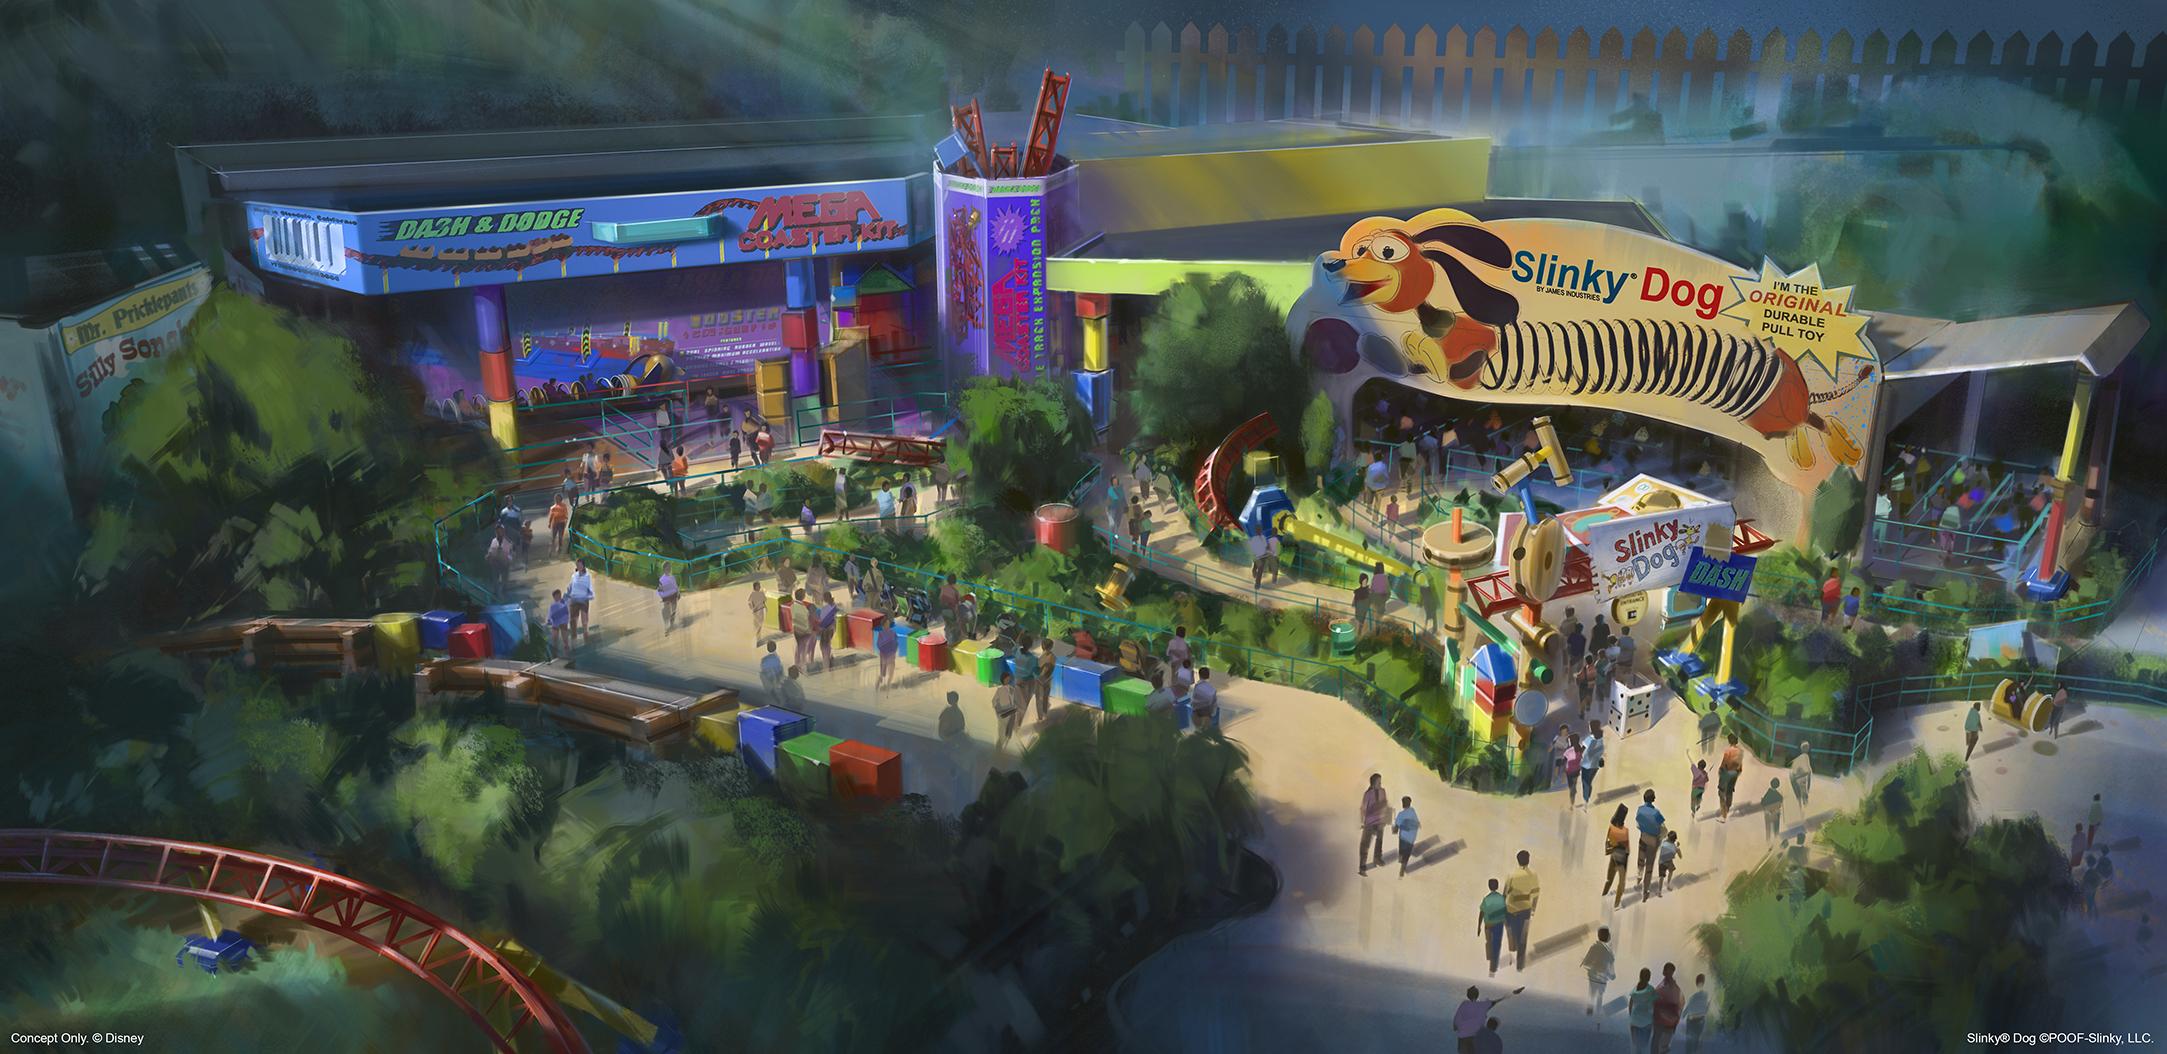 Slinky-Dog-Toy-Story-Land.jpg